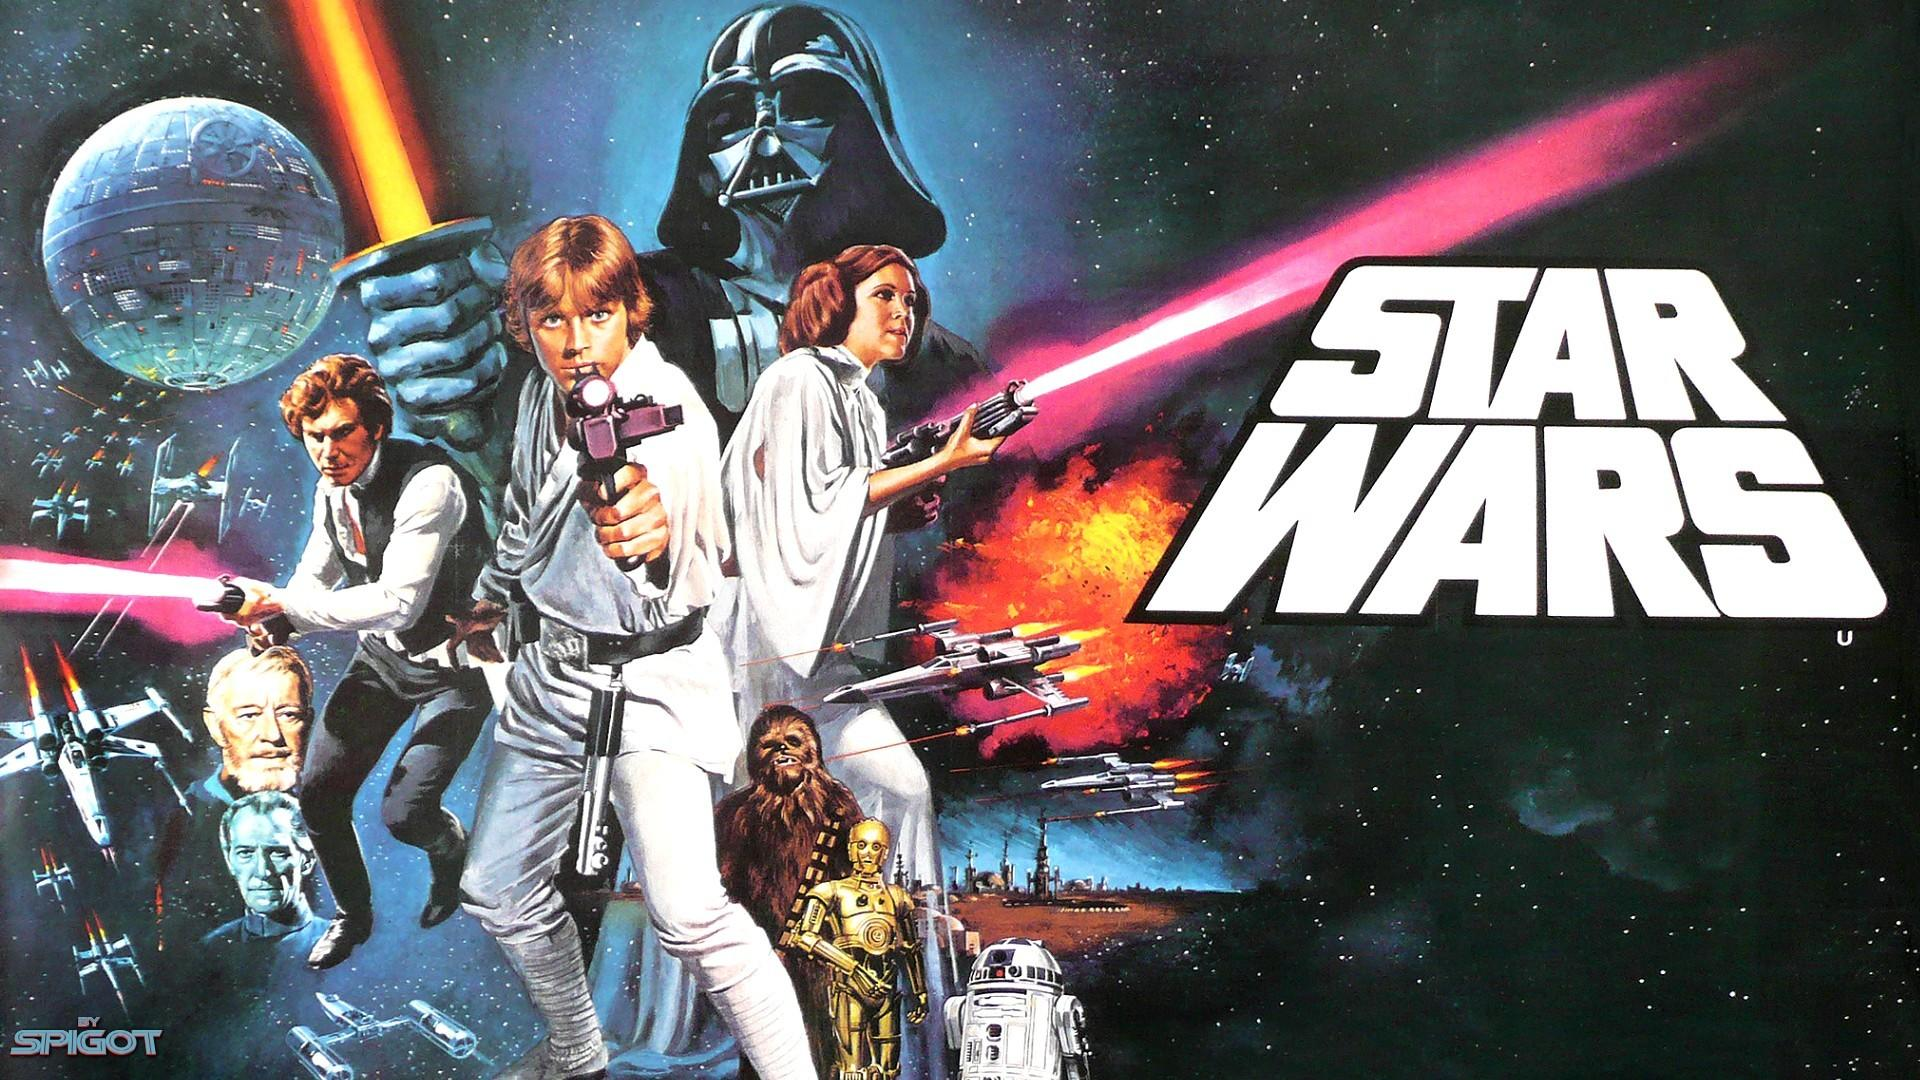 Vintage Star Wars Wallpapers Wallpaper Cave